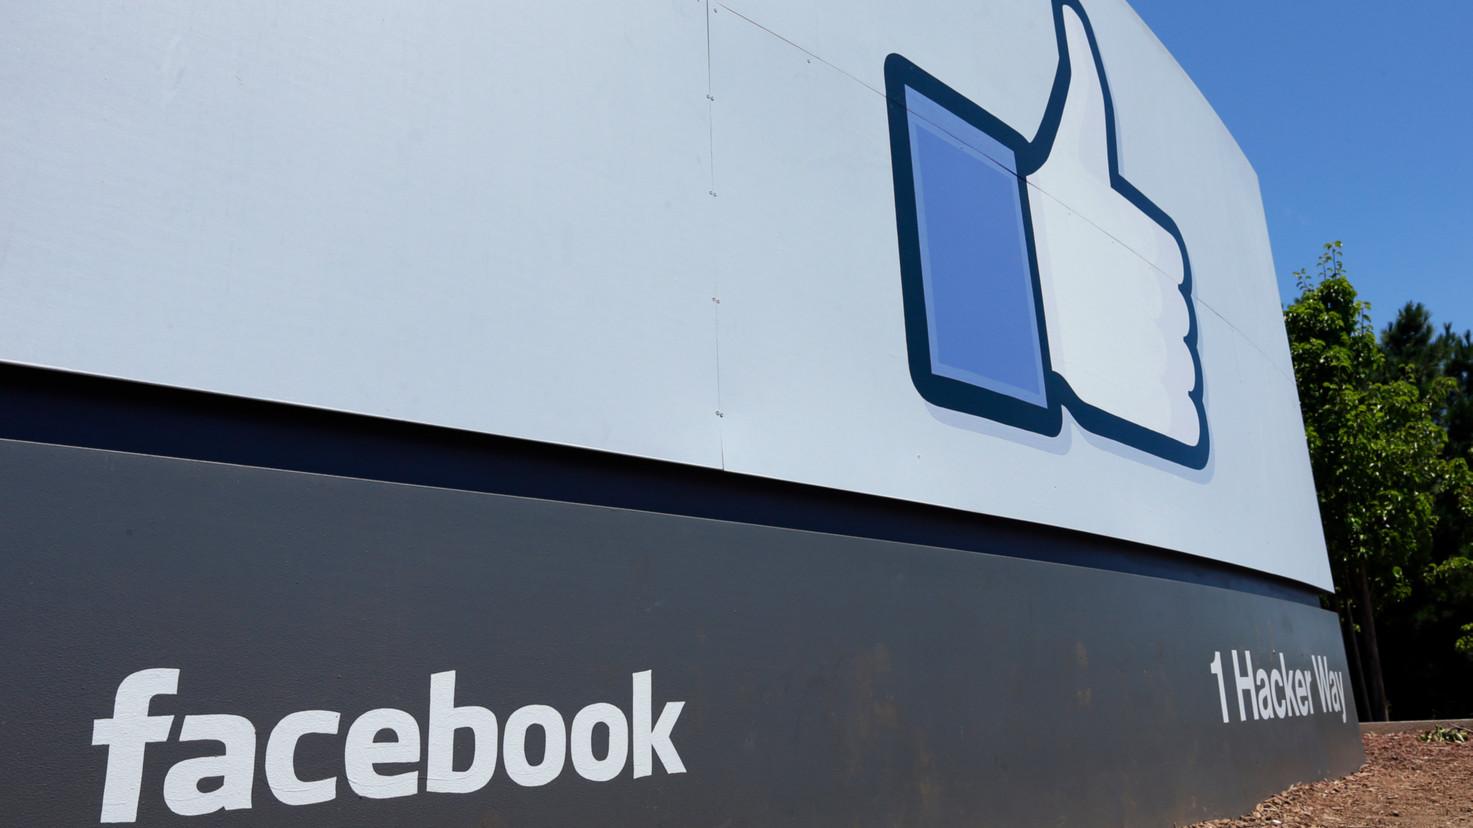 Facebook company profile